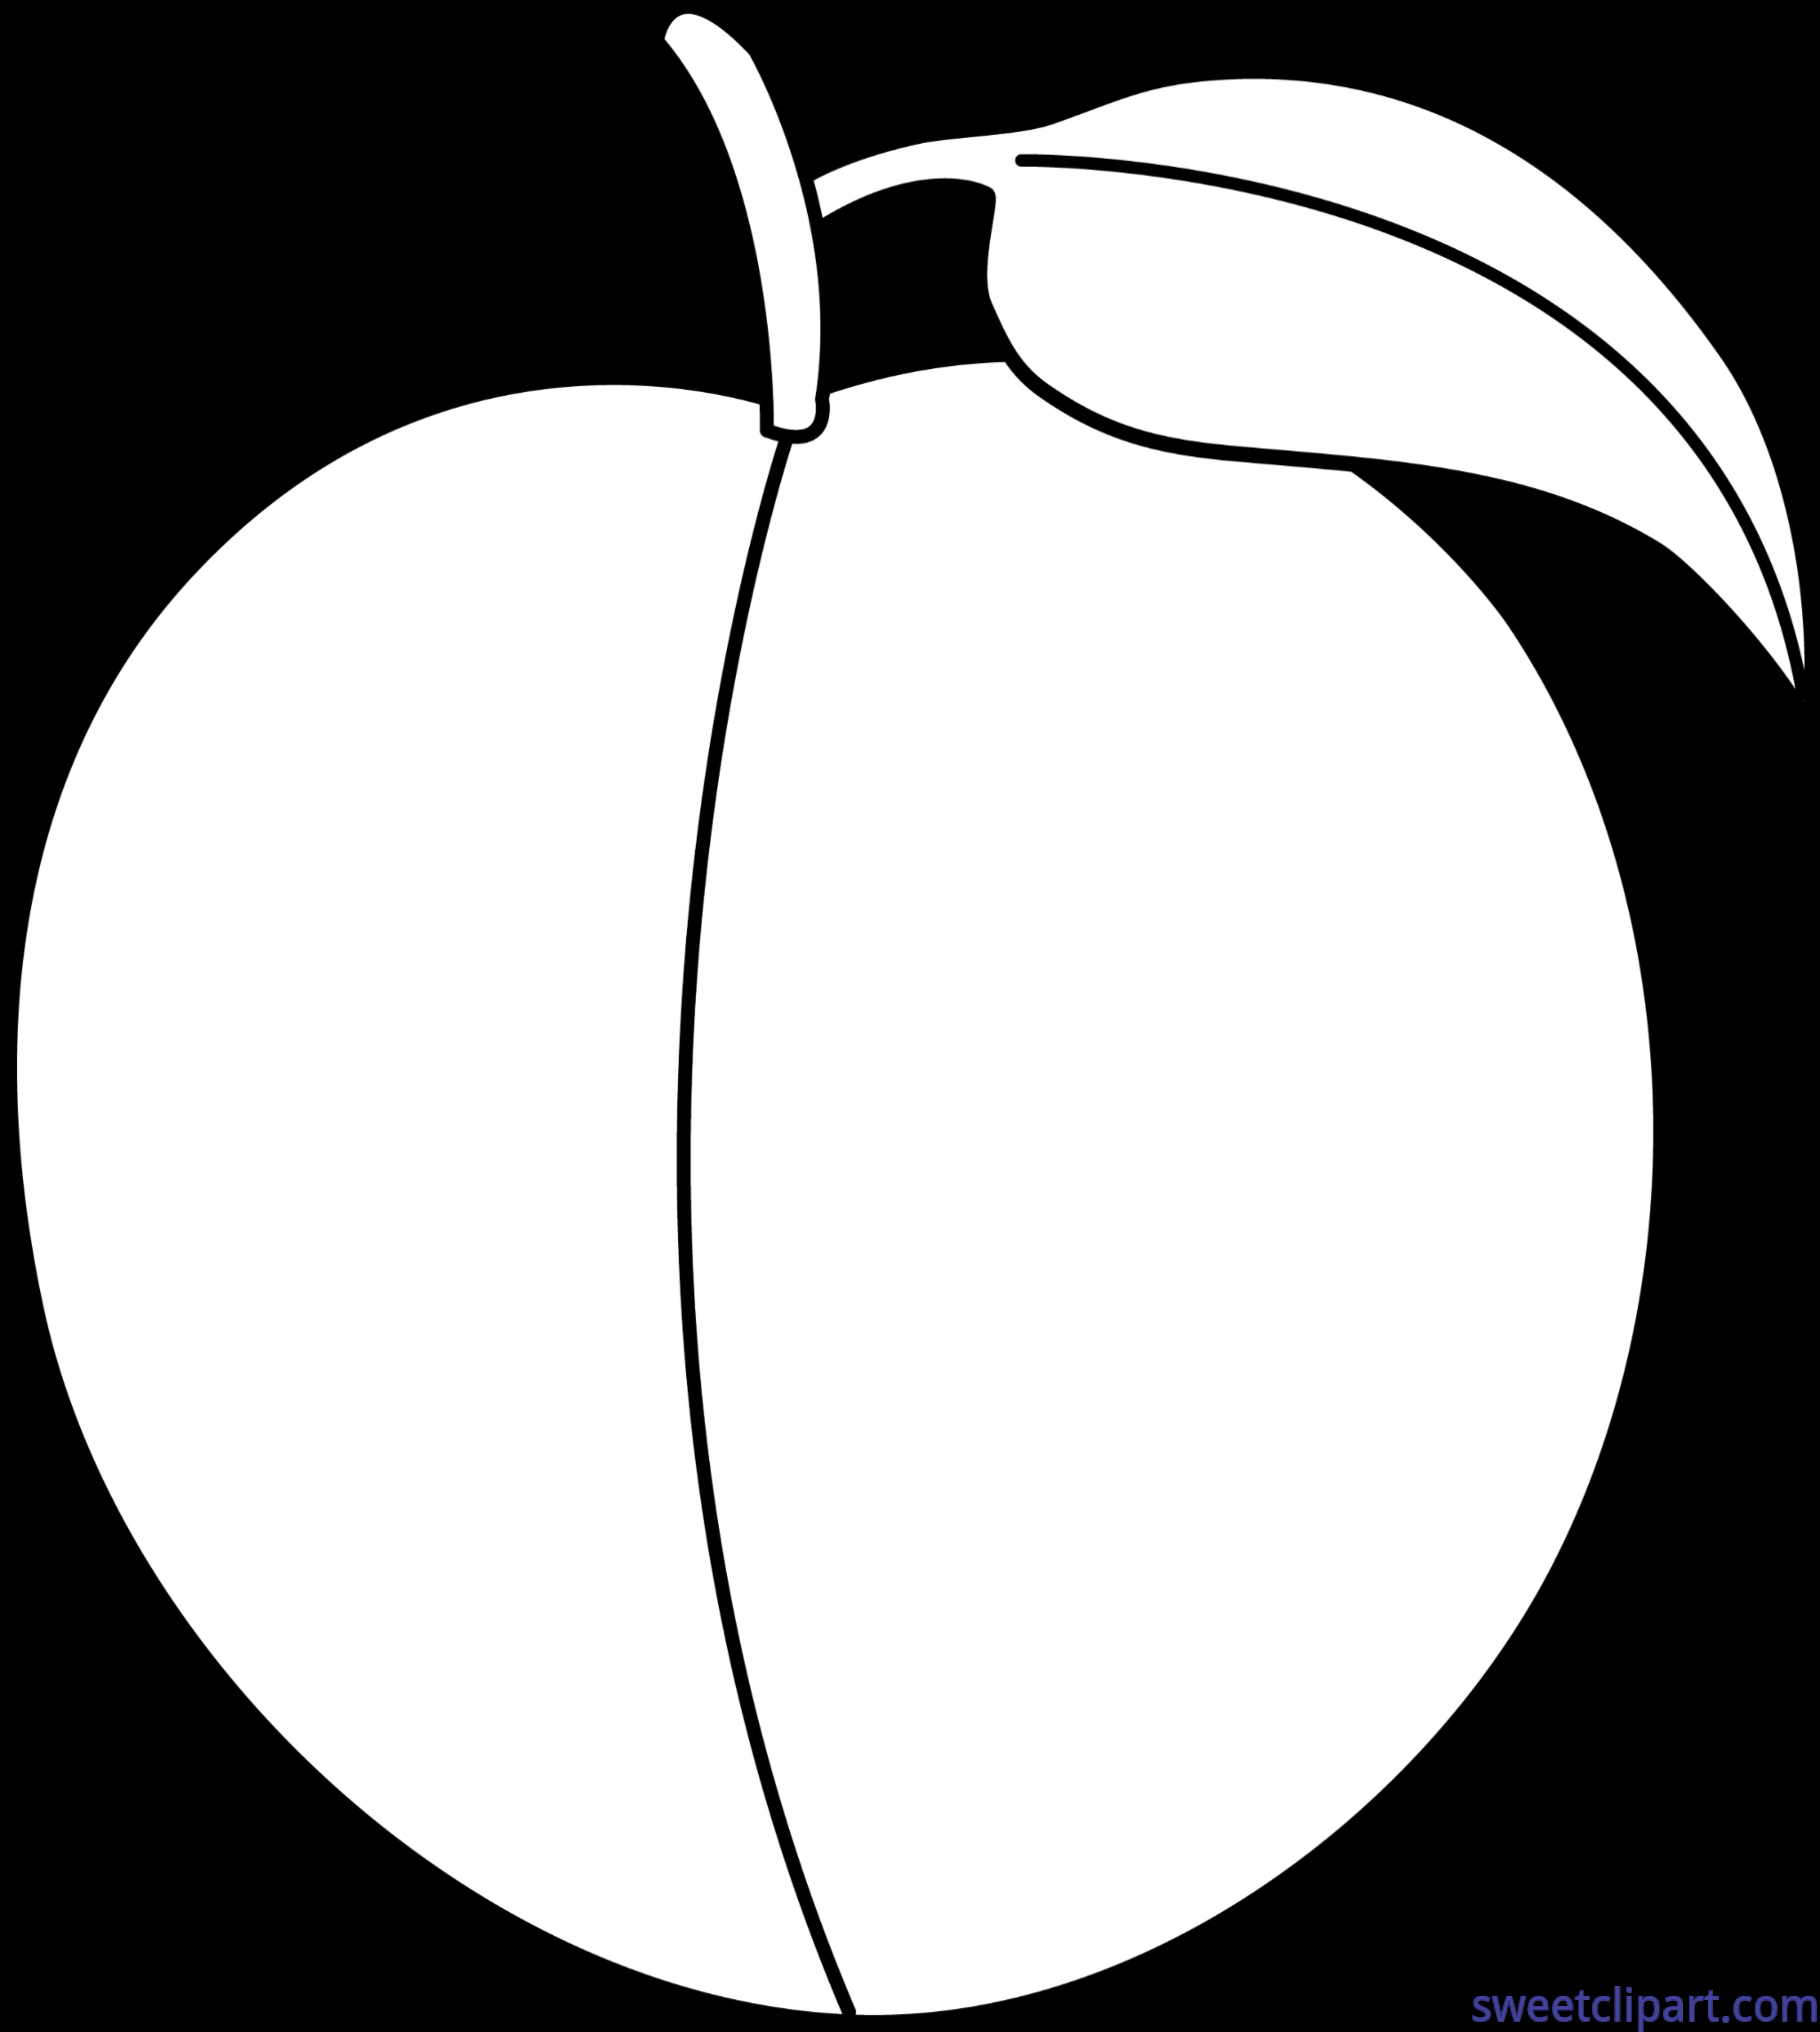 Clipart peach tree vector freeuse Peach Lineart Clip Art - Sweet Clip Art vector freeuse